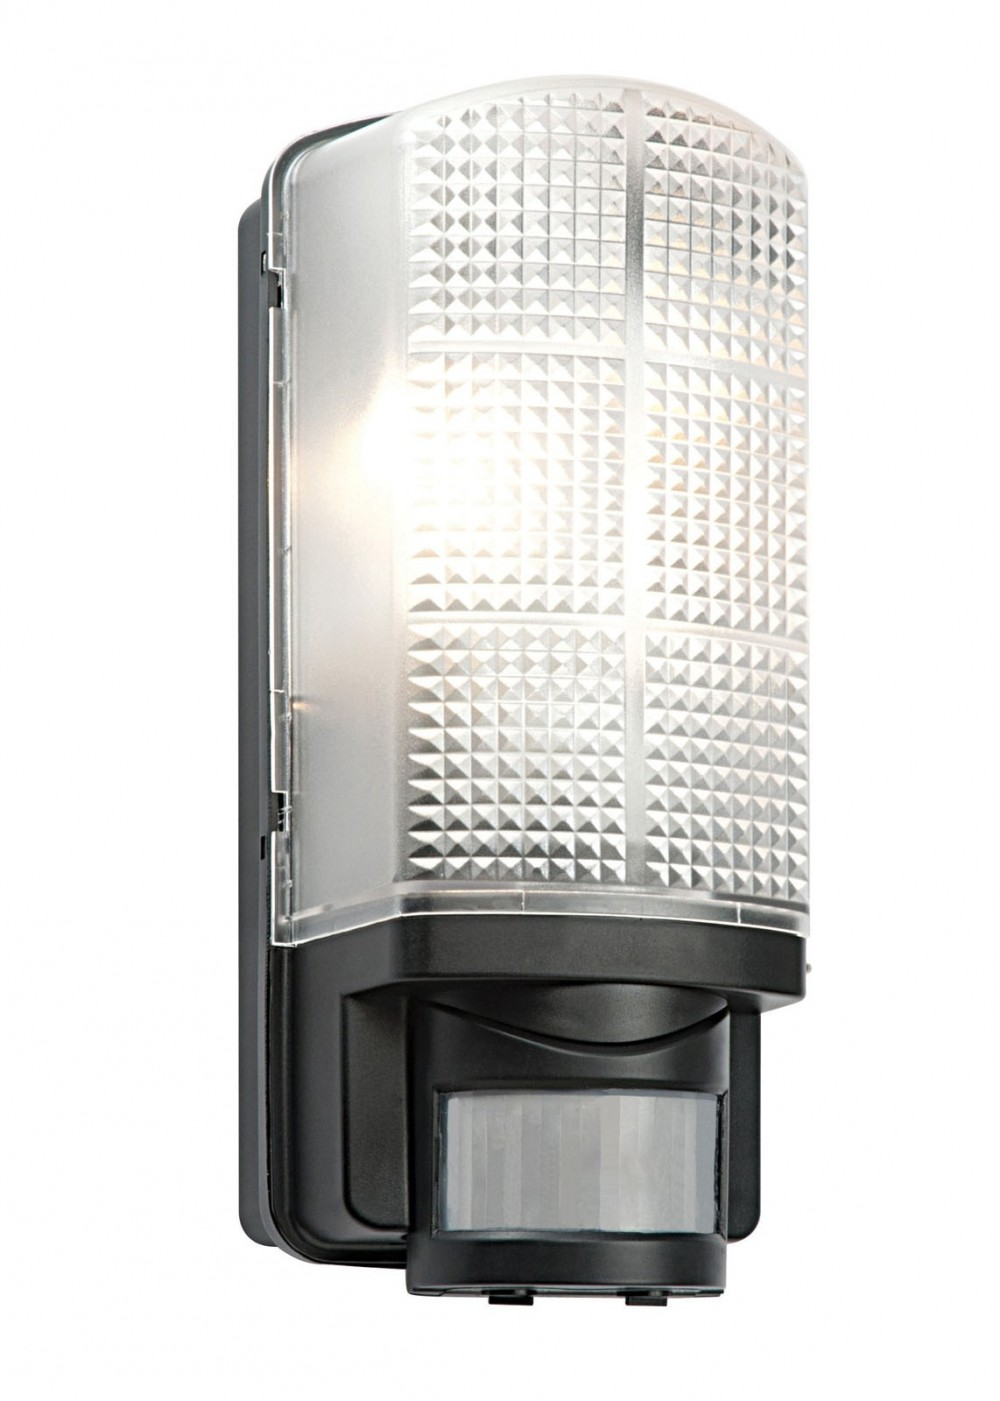 Outdoor Motion Sensor Wall Lights Light In Just A Swipe